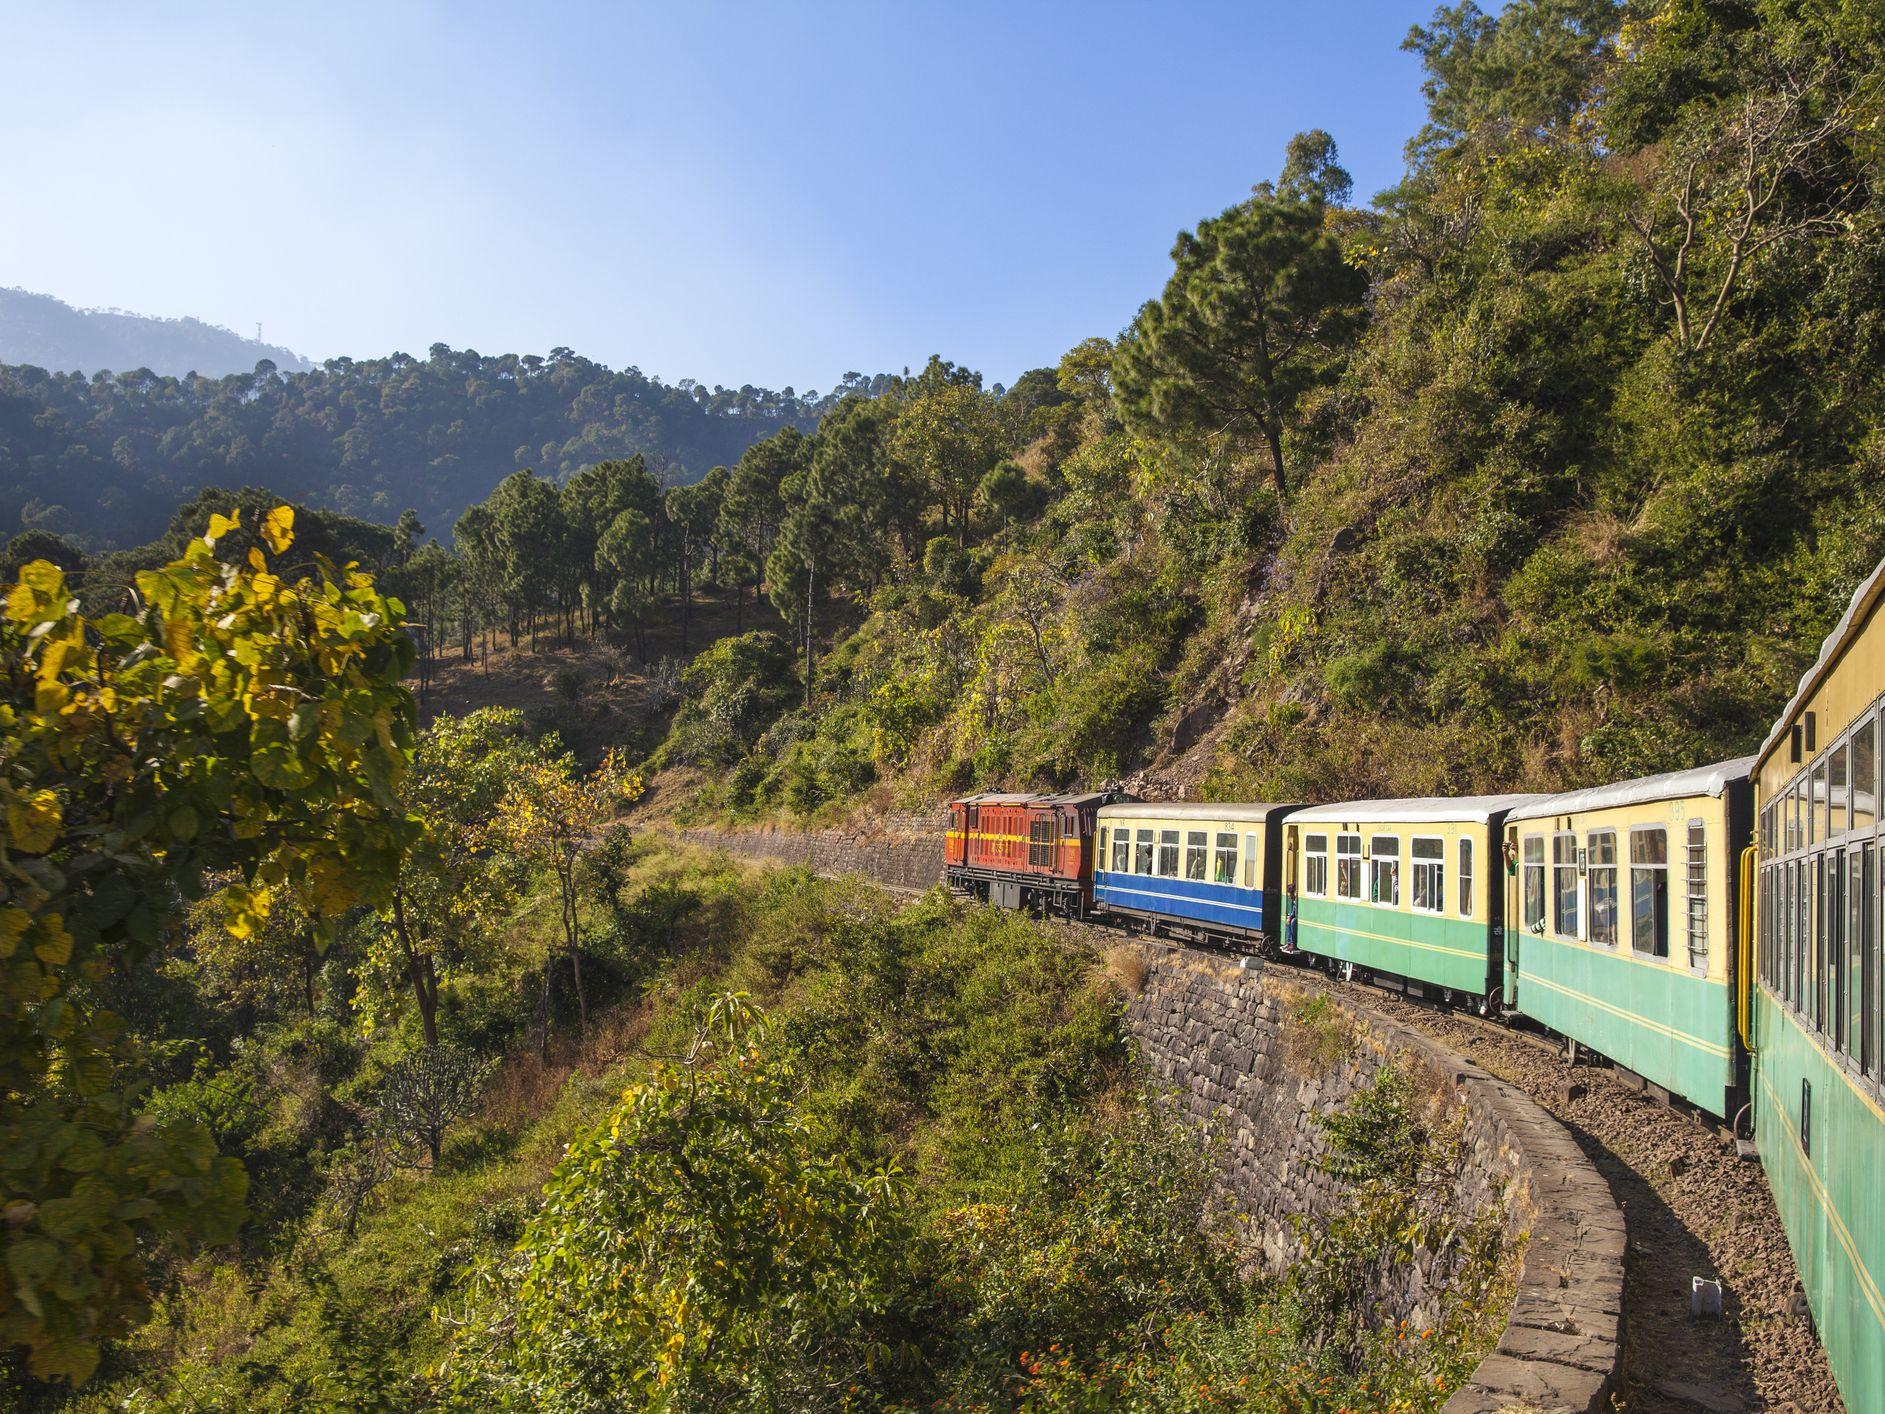 Kalka Shimla Railway: Toy Train Travel Guide